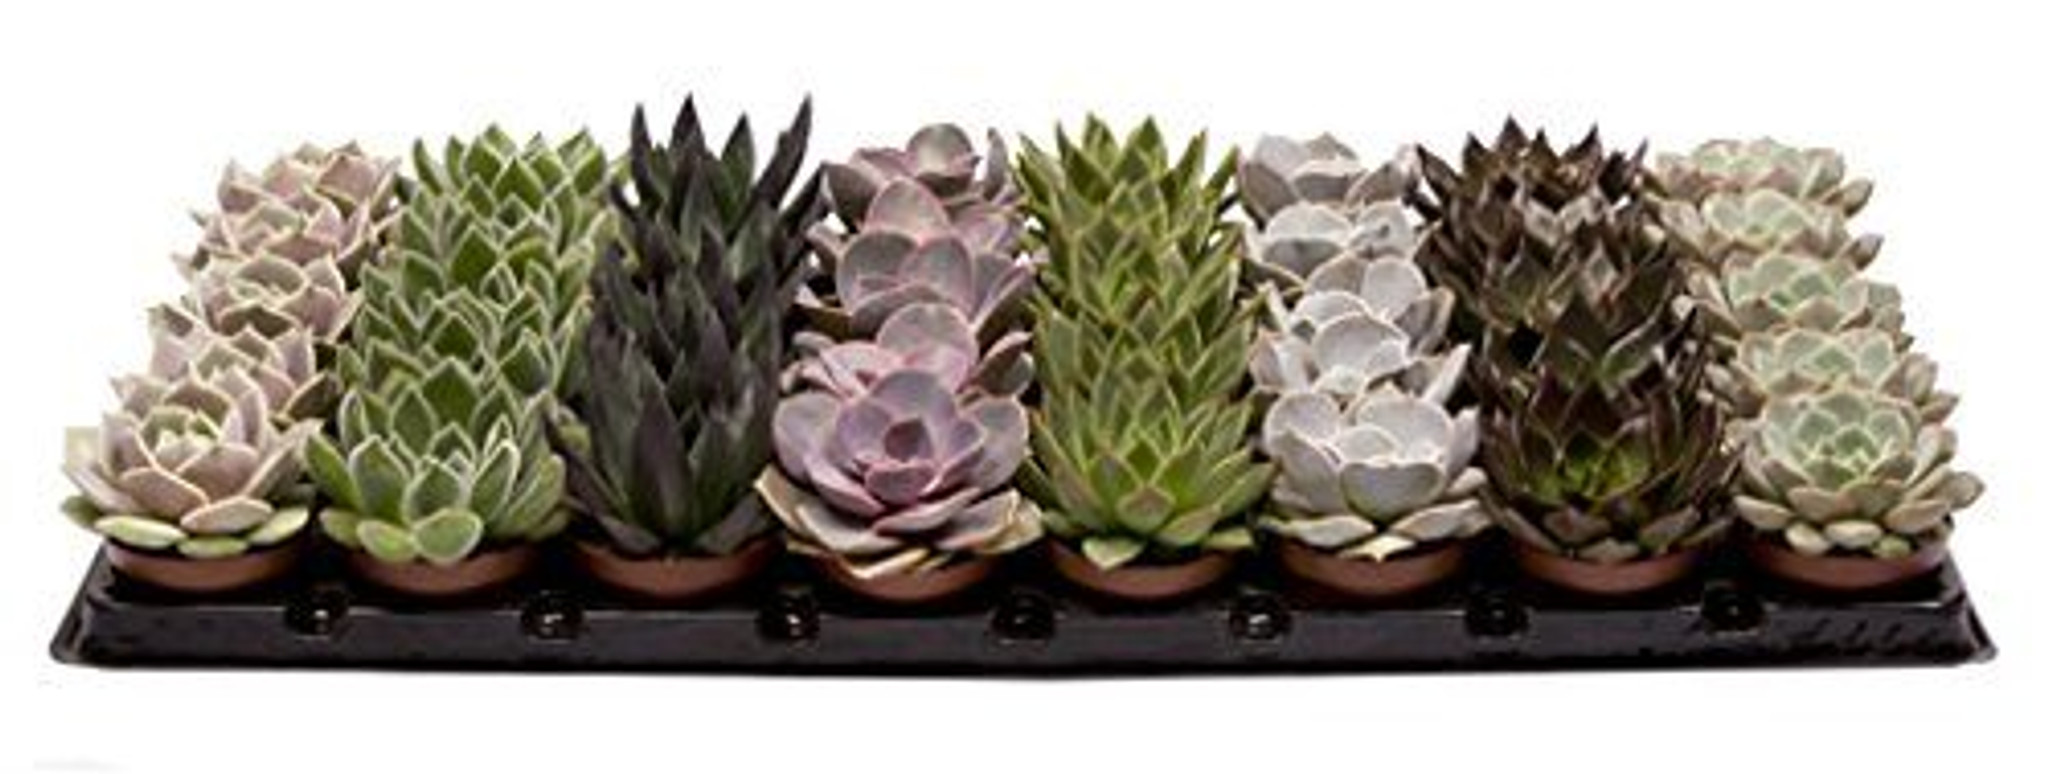 Set of 8 Echeveria Hybrid Succulent